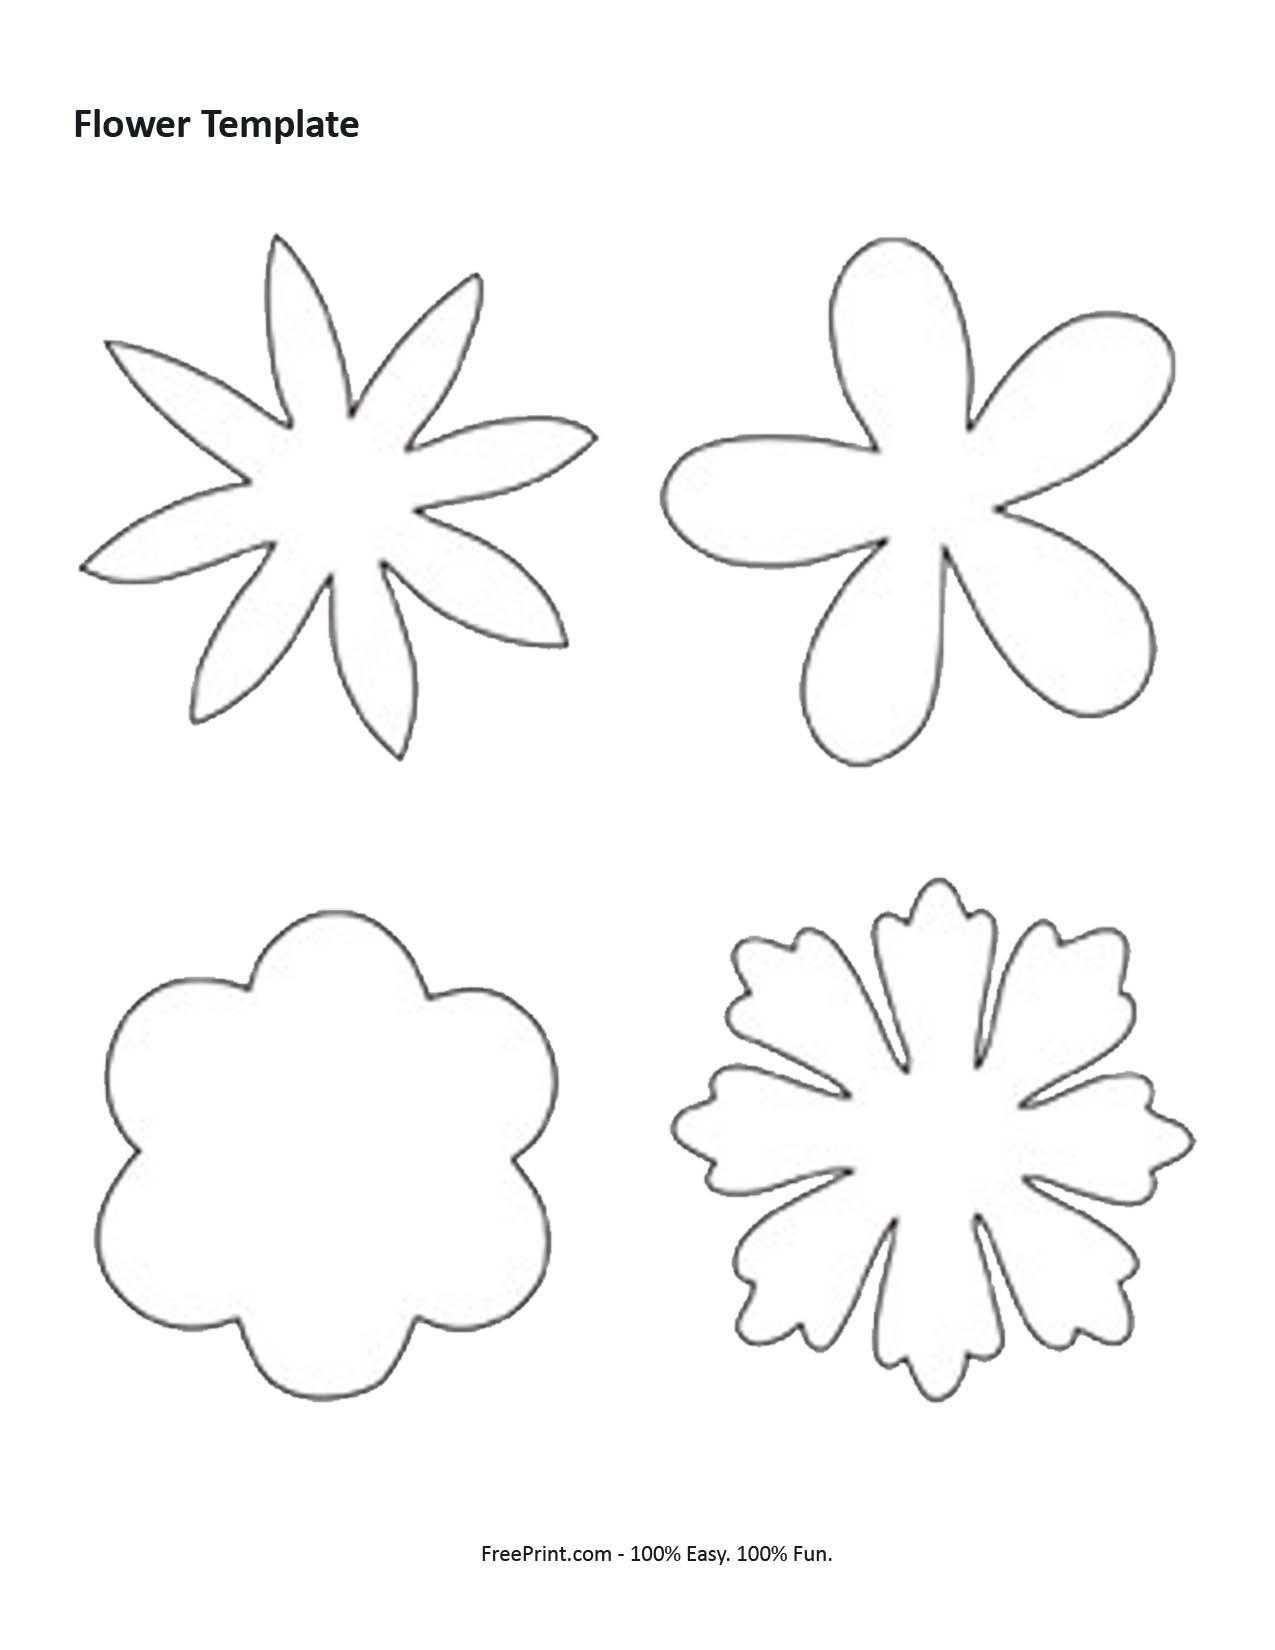 Printable Flower Templates